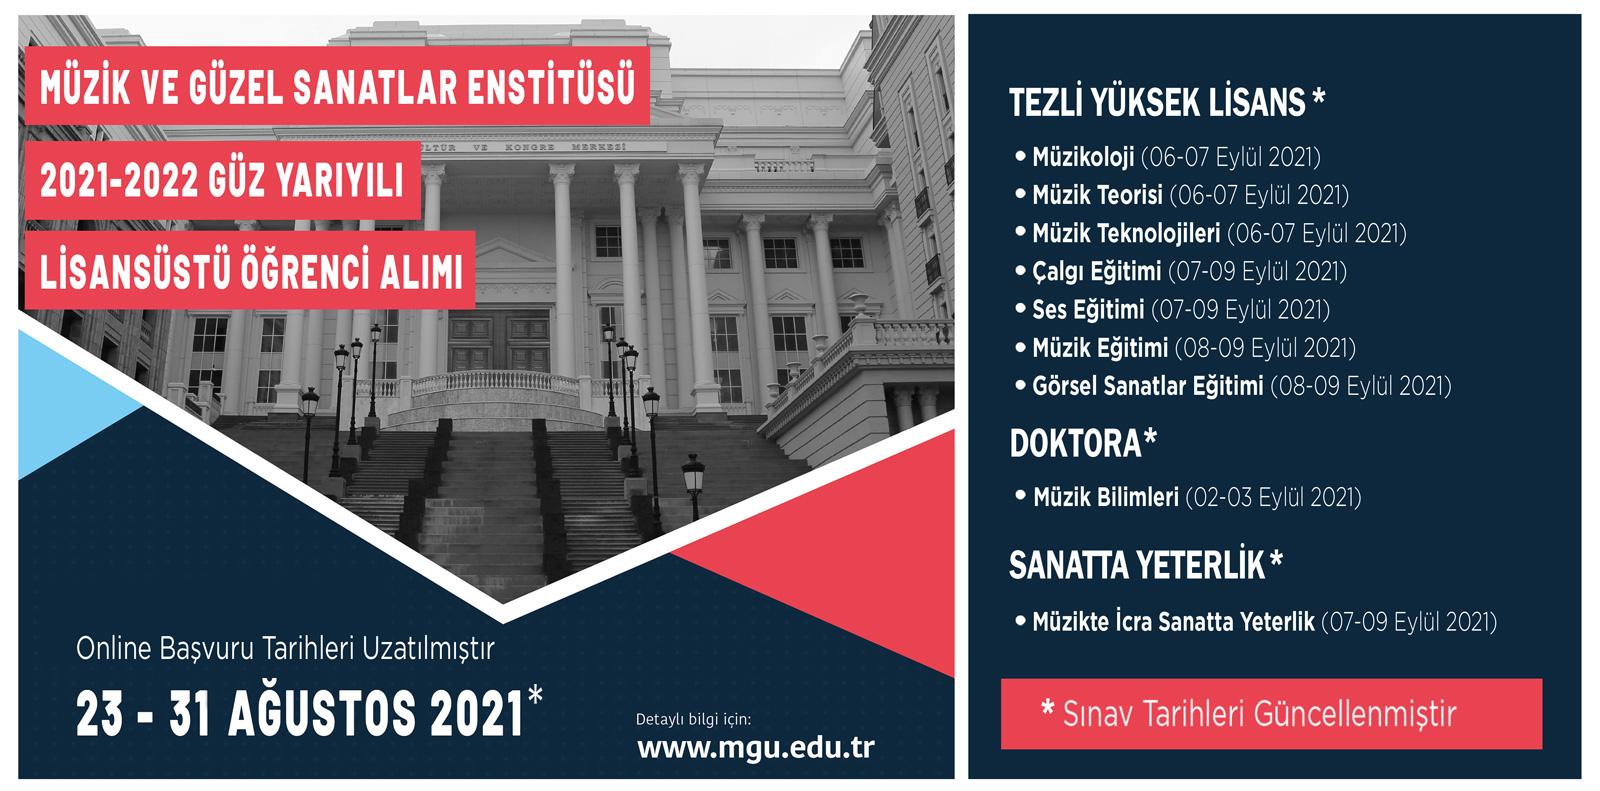 Enstitü Yükseklisans Slide